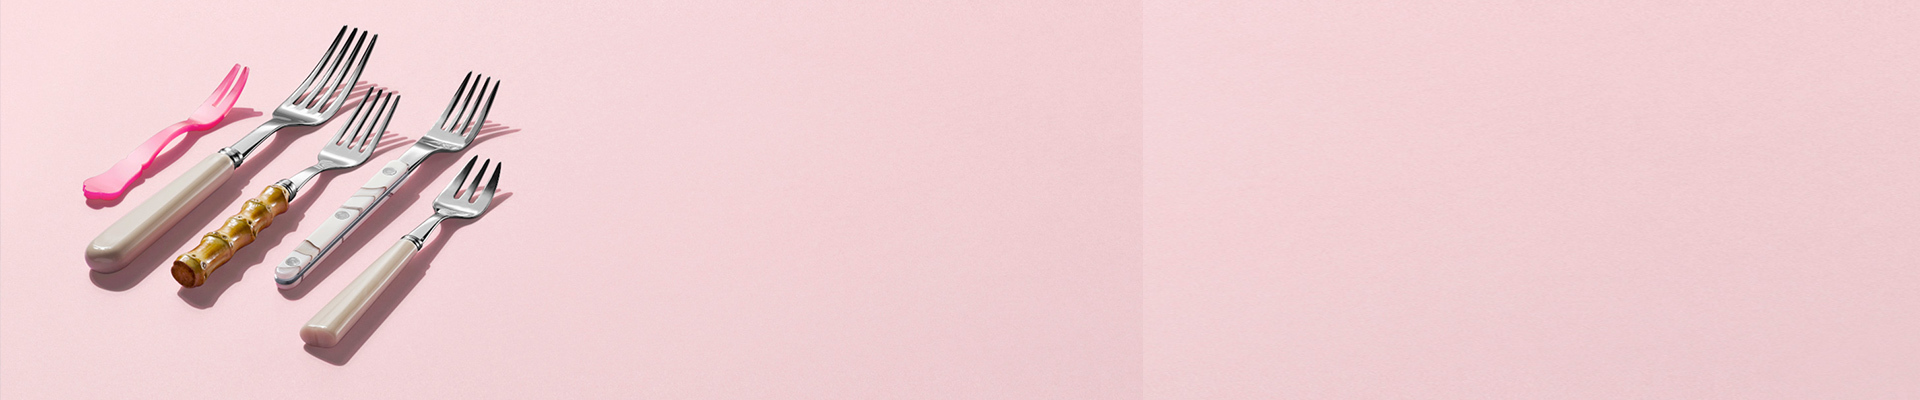 Sabre Paris,Tableware,Tableware knife, fork, spoon, serving accessories, kitchen accessories, 餐刀,餐叉,咖啡匙,茶匙,點心叉,牛排刀,刀,叉,匙